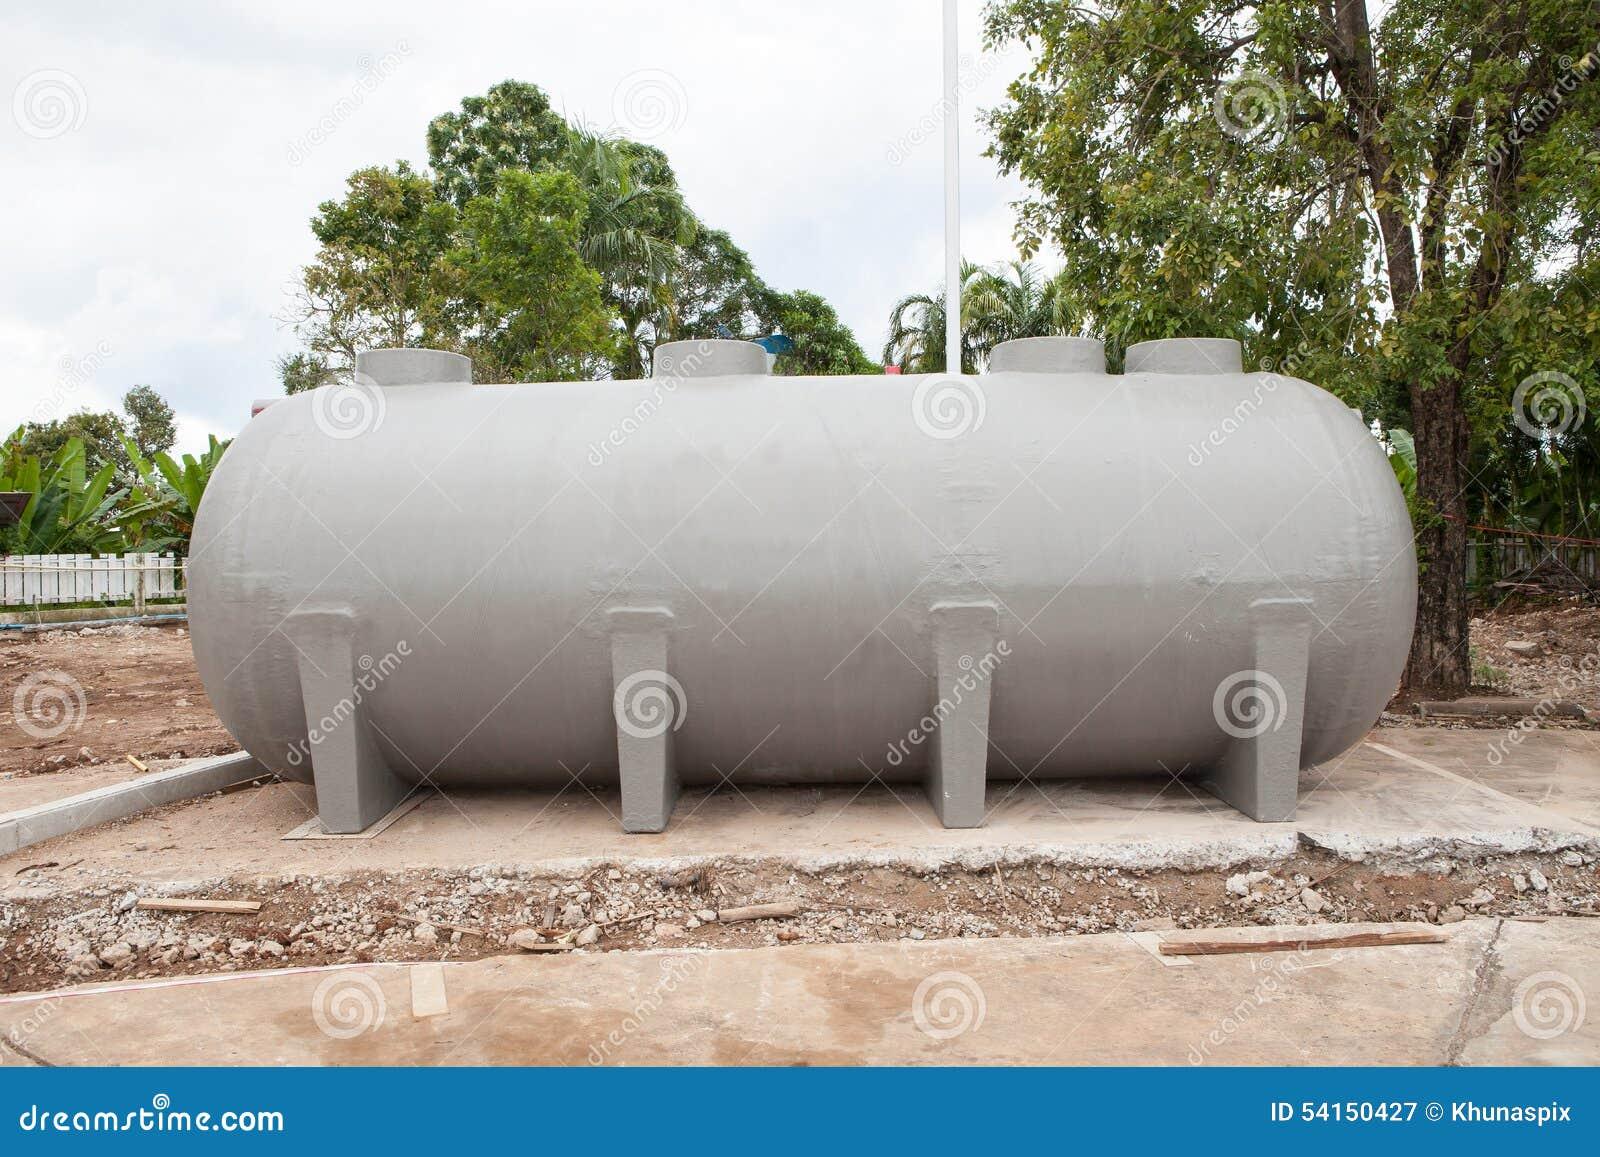 Underground Water Reserve Tank Preparing In Construction Site Pl